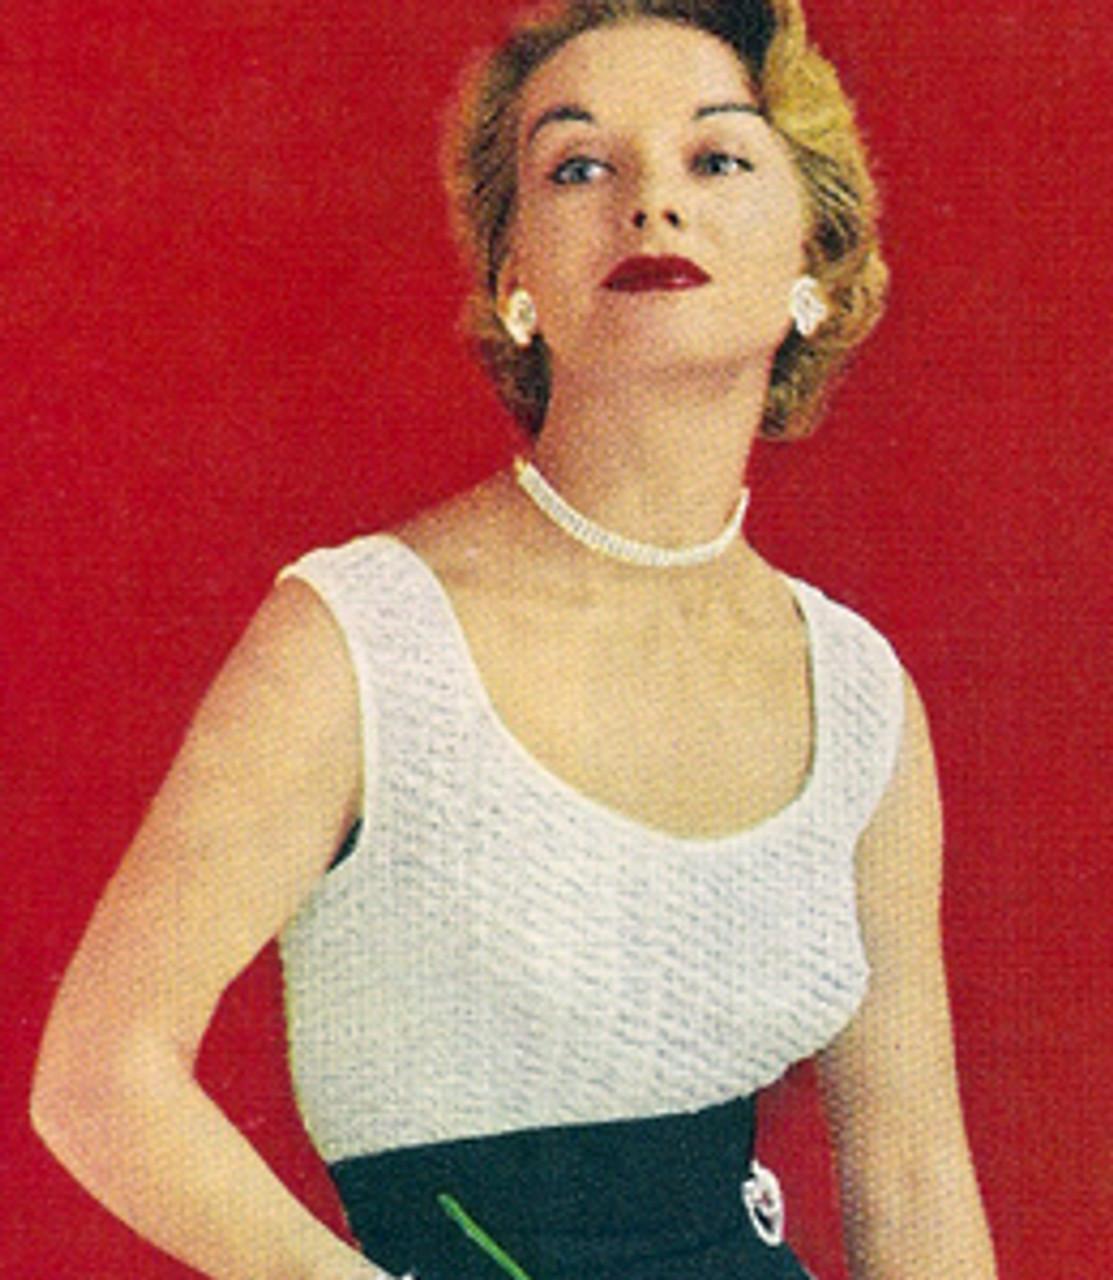 Low Cut Crocheted Evening Blouse, Sleeveless